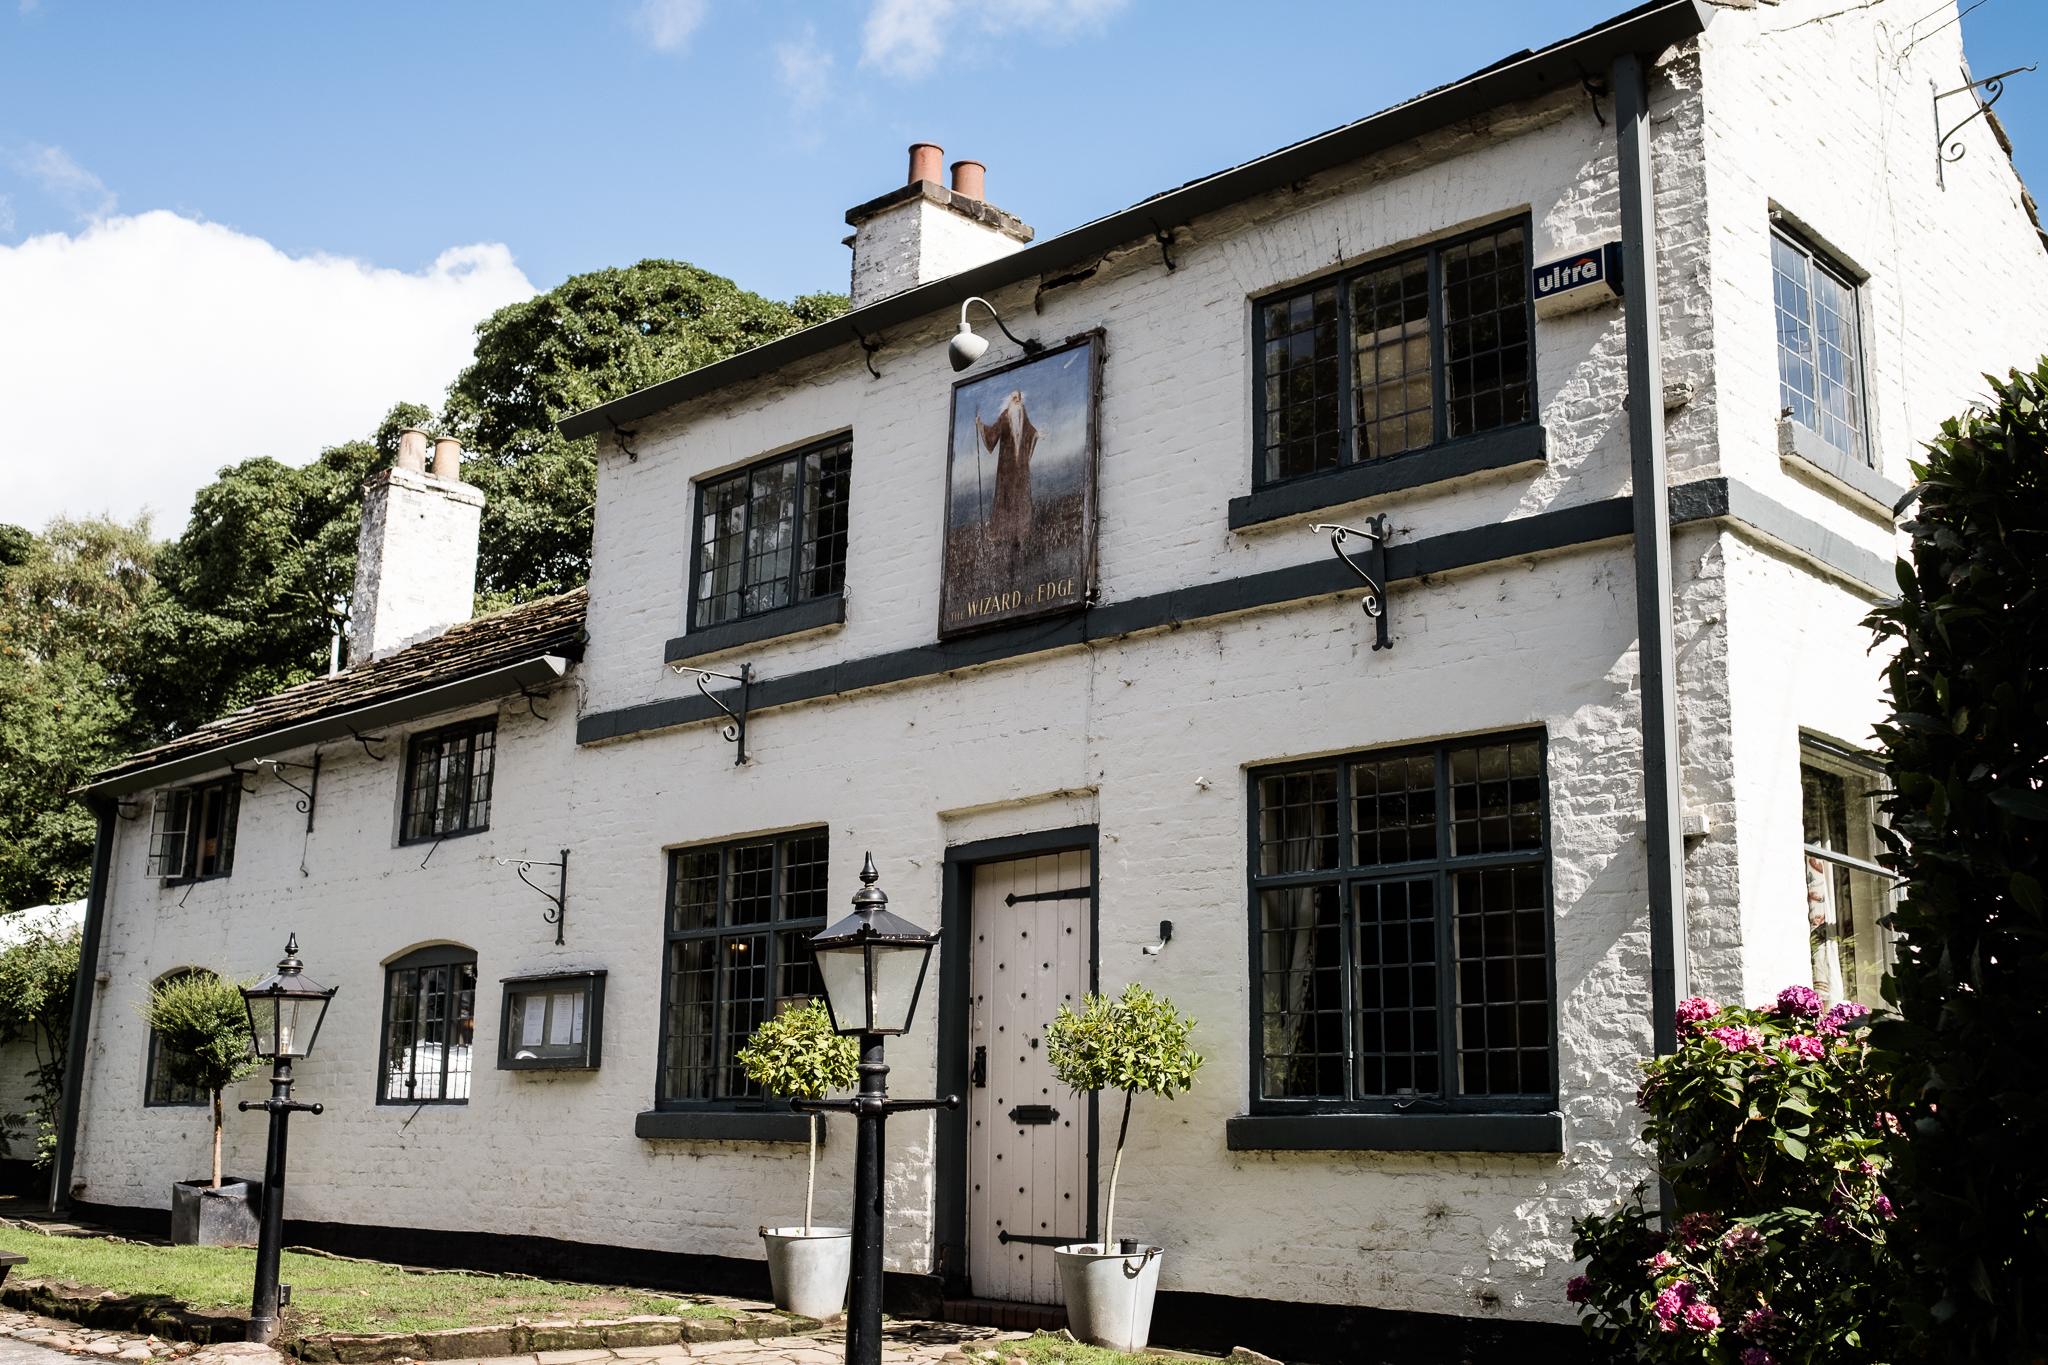 Relaxed Documentary Wedding Photography at The Wizard Inn, Alderley Edge Cheshire - Jenny Harper-13.jpg